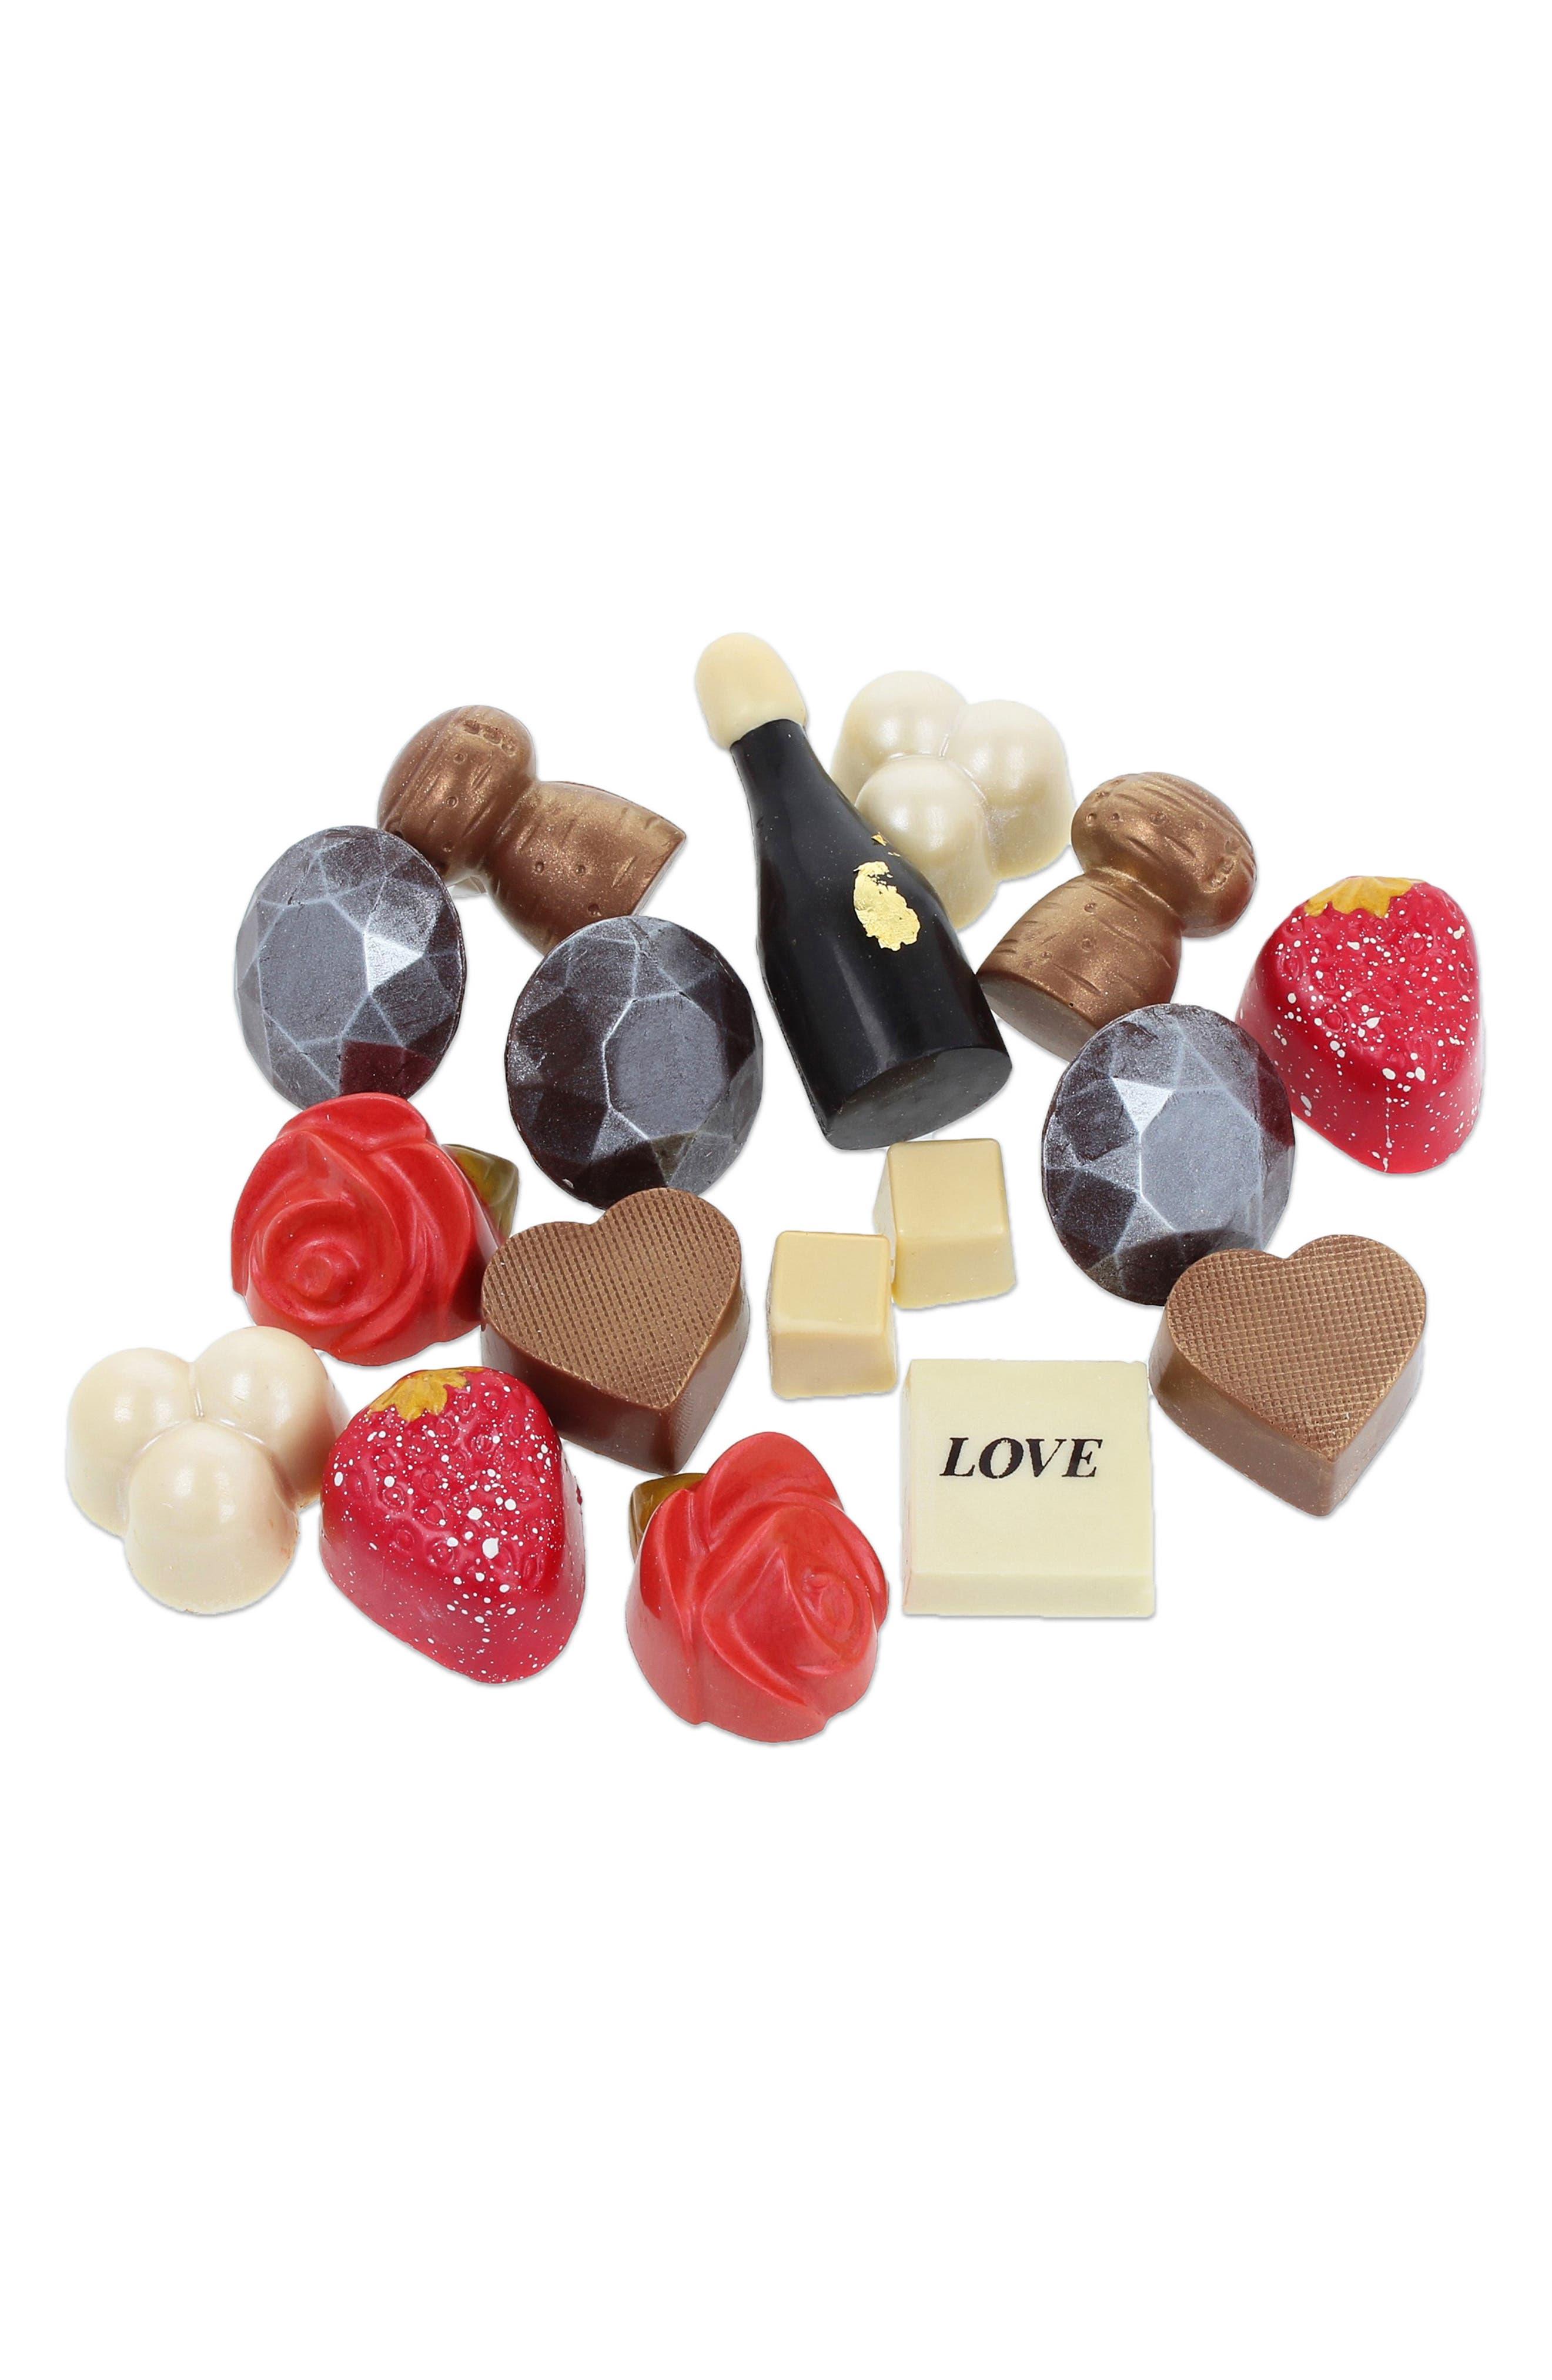 MAGGIE LOUISE CONFECTIONS,                             Lovestruck 16-Piece Chocolate Set,                             Alternate thumbnail 2, color,                             WHITE